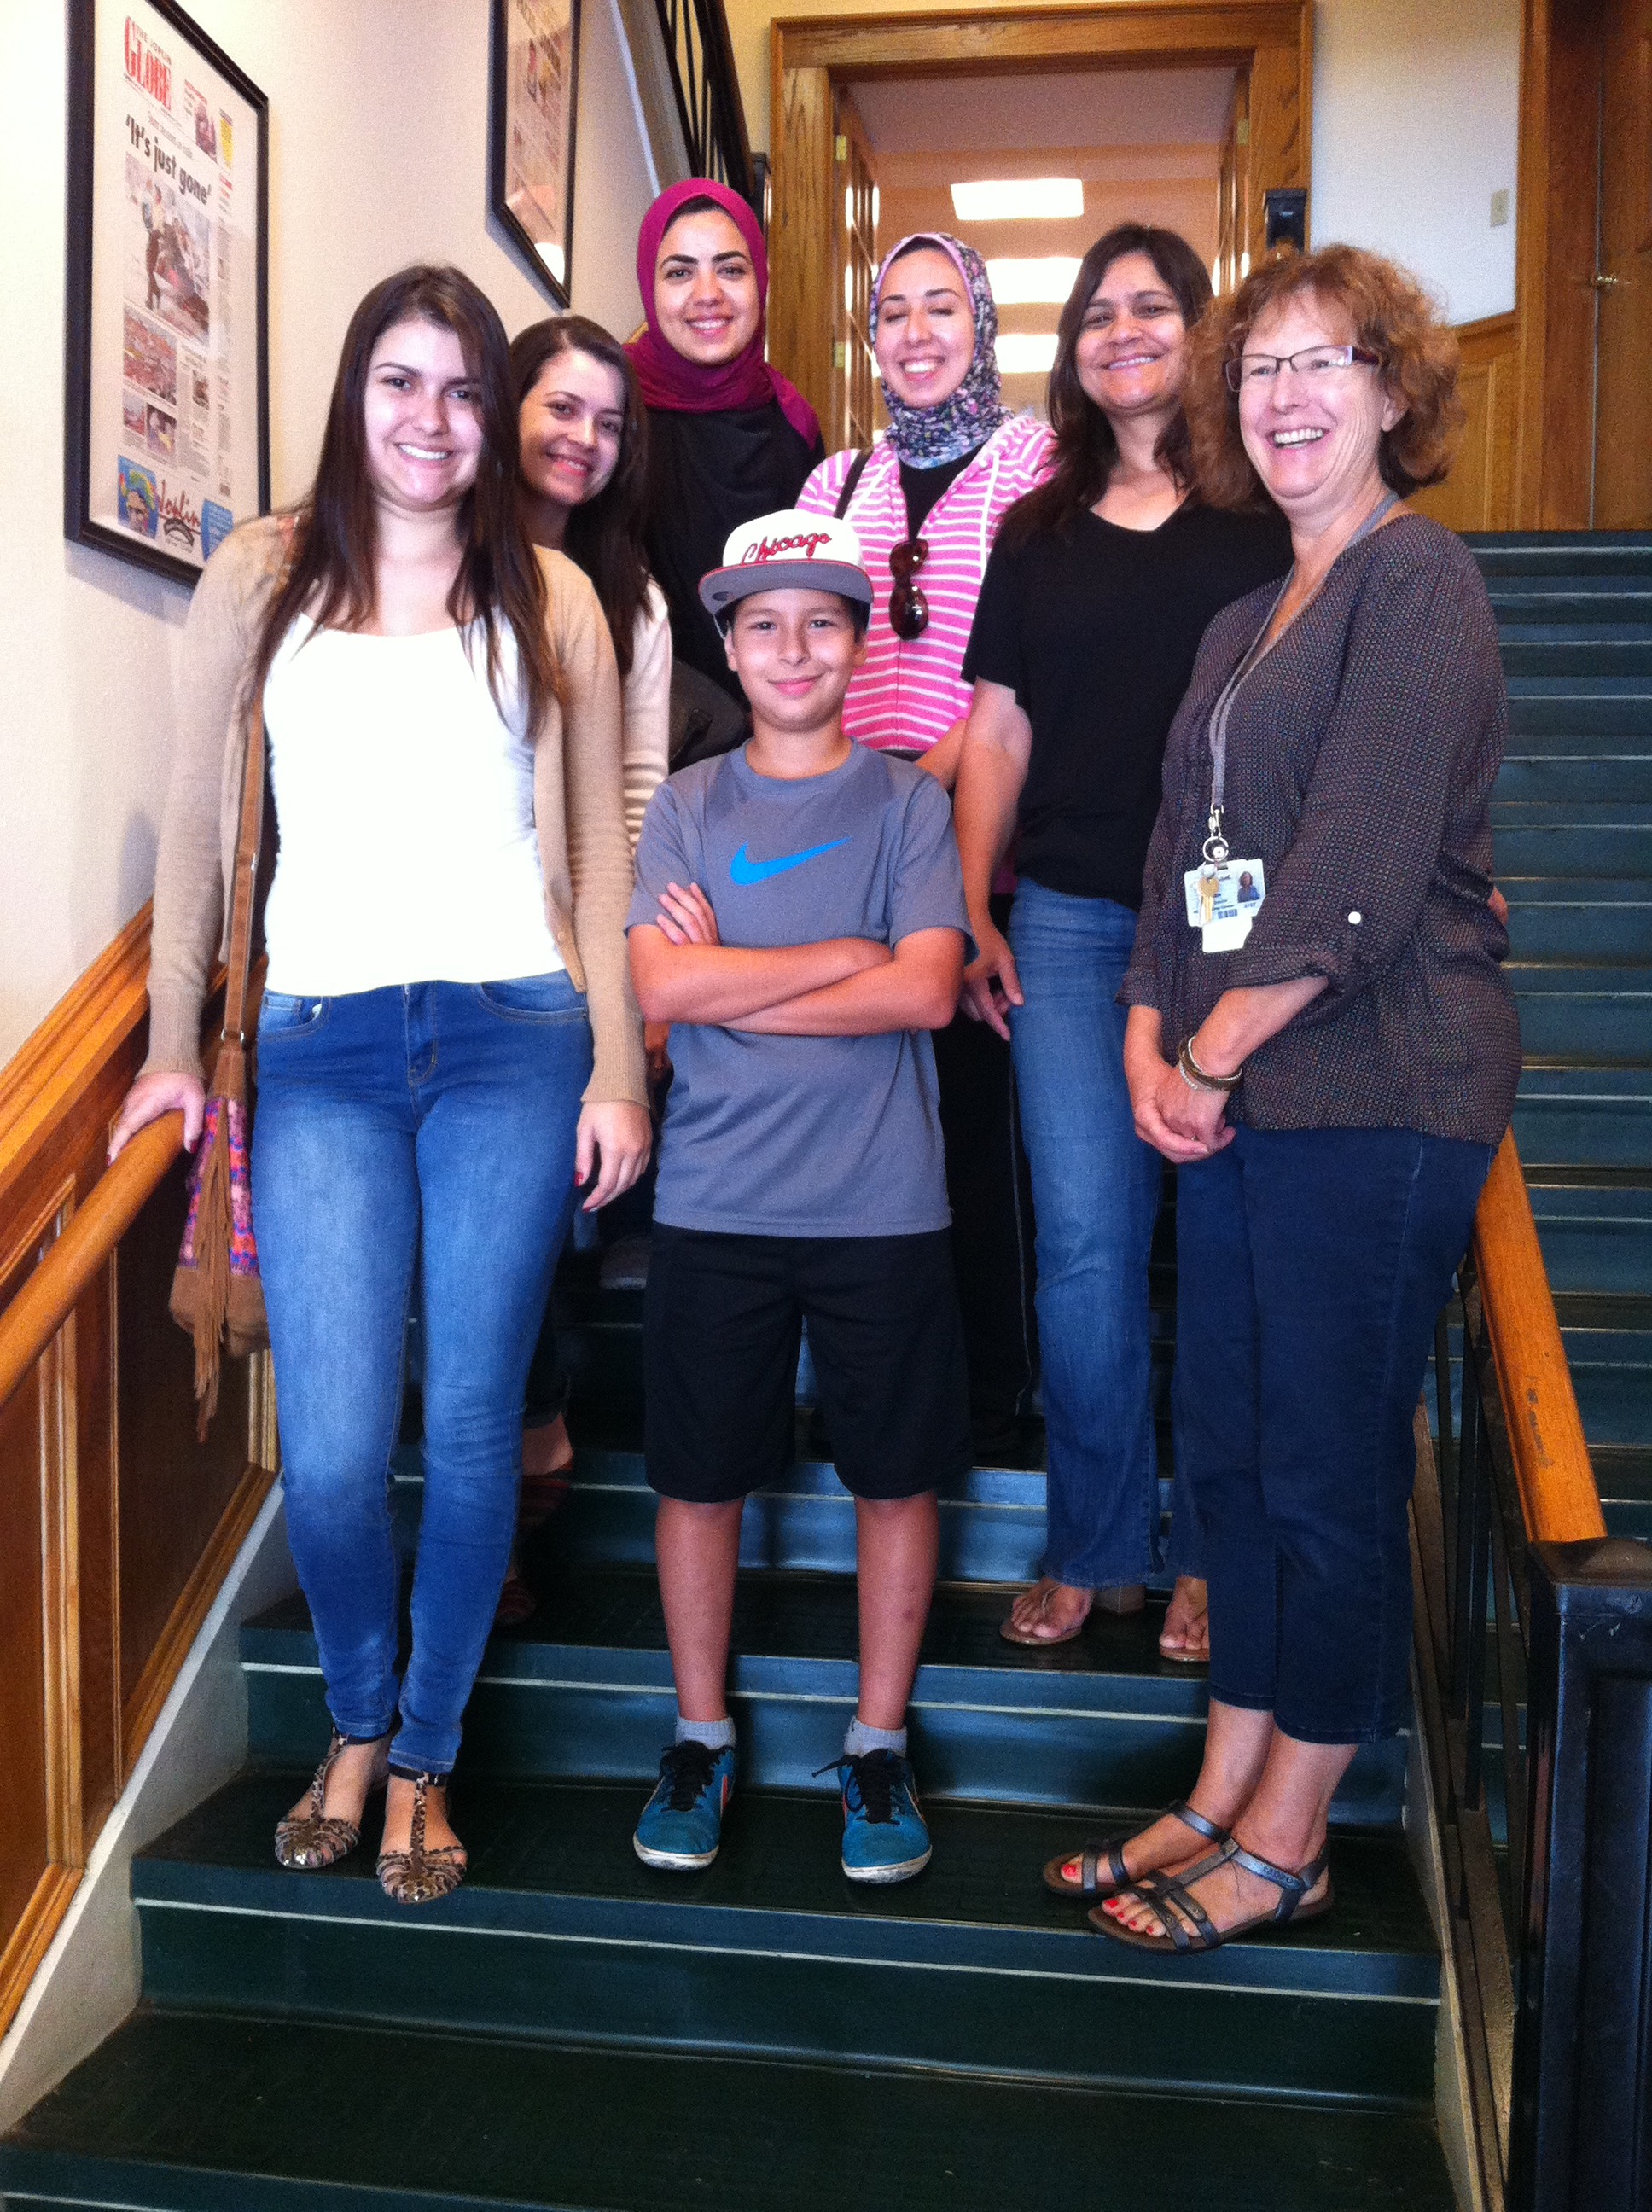 Joplin NALA ESL students visit The Joplin Globe in downtown Joplin, MO.